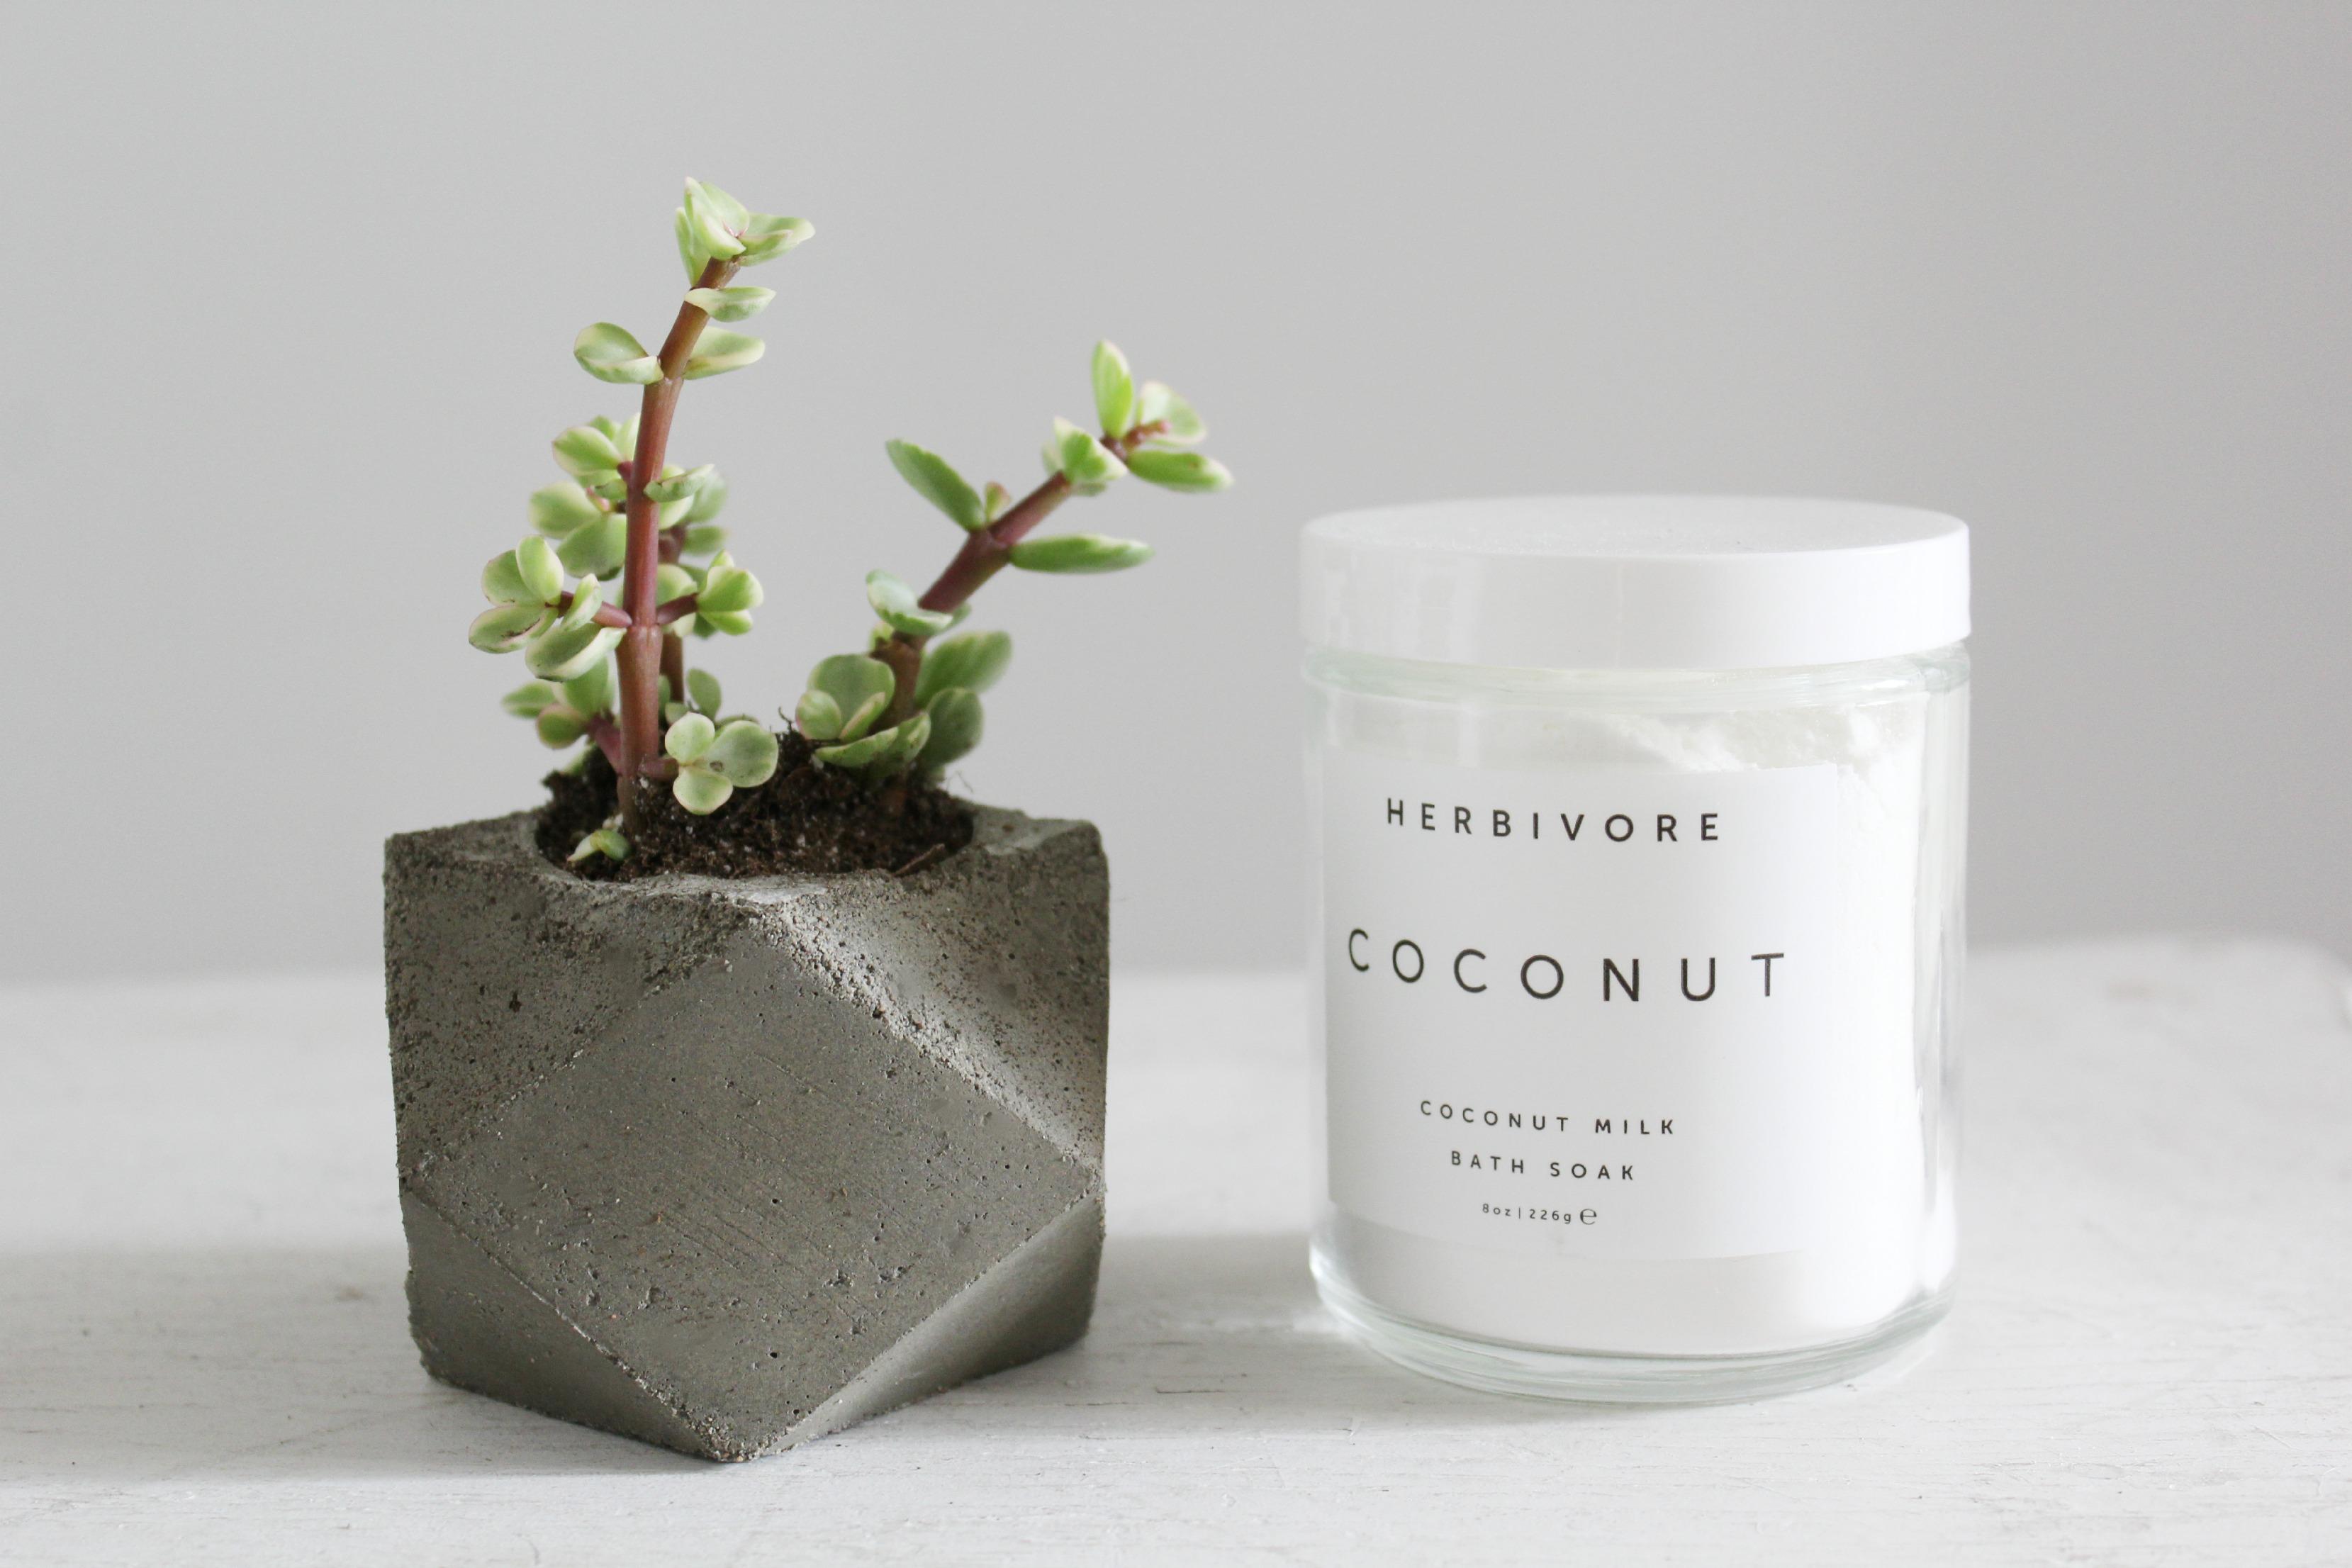 herbivore botanicals & succulents // gingersnapsblog